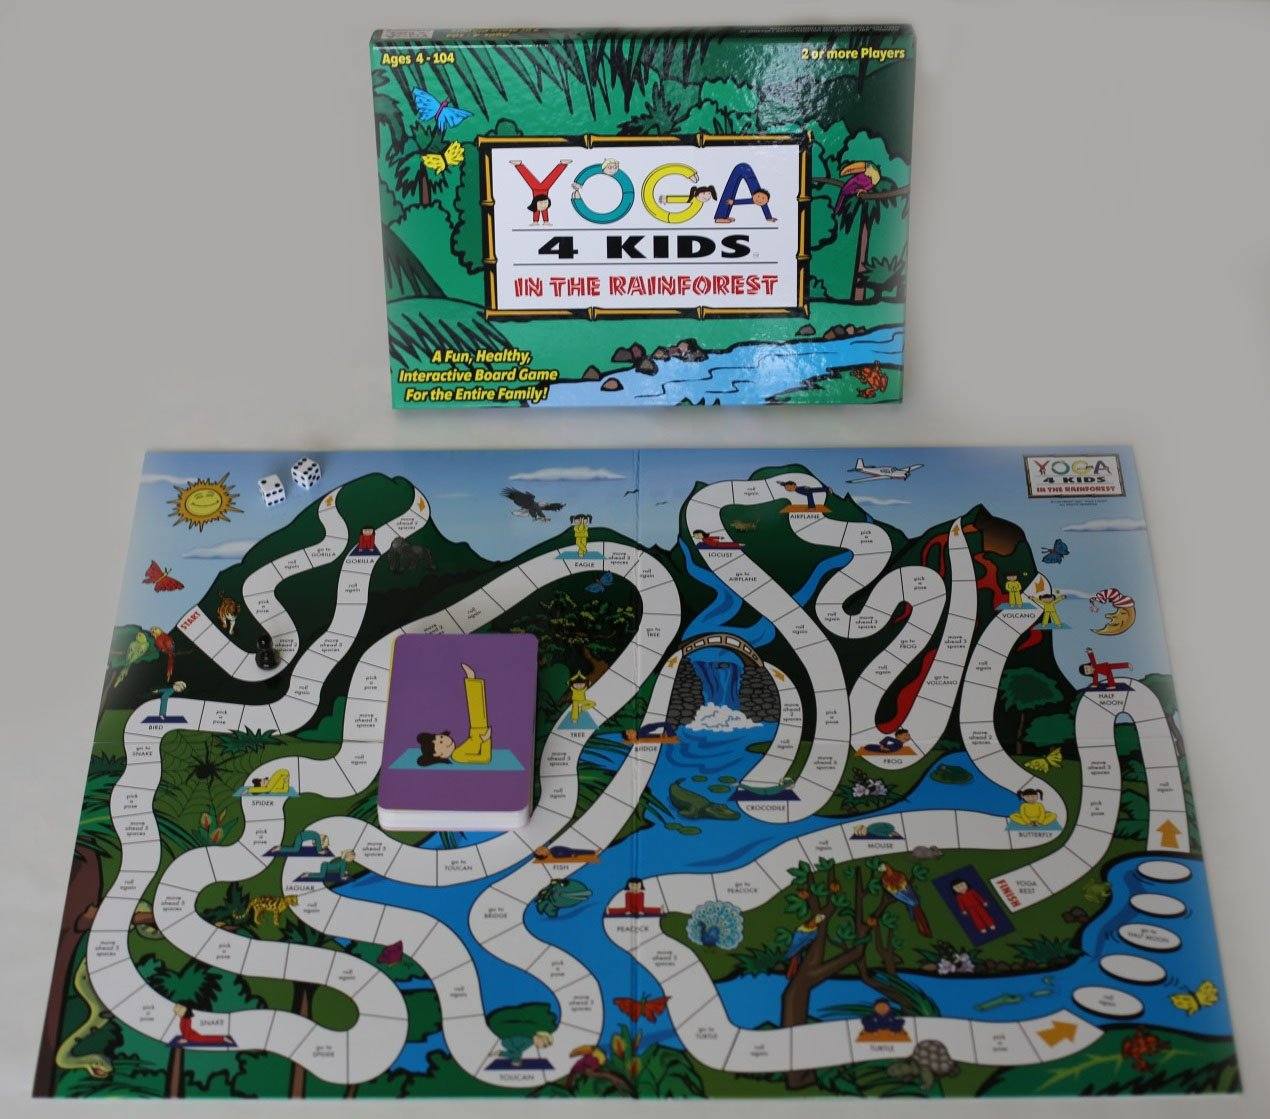 Amazon.com: Yoga 4 Kids Juegos: Toys & Games